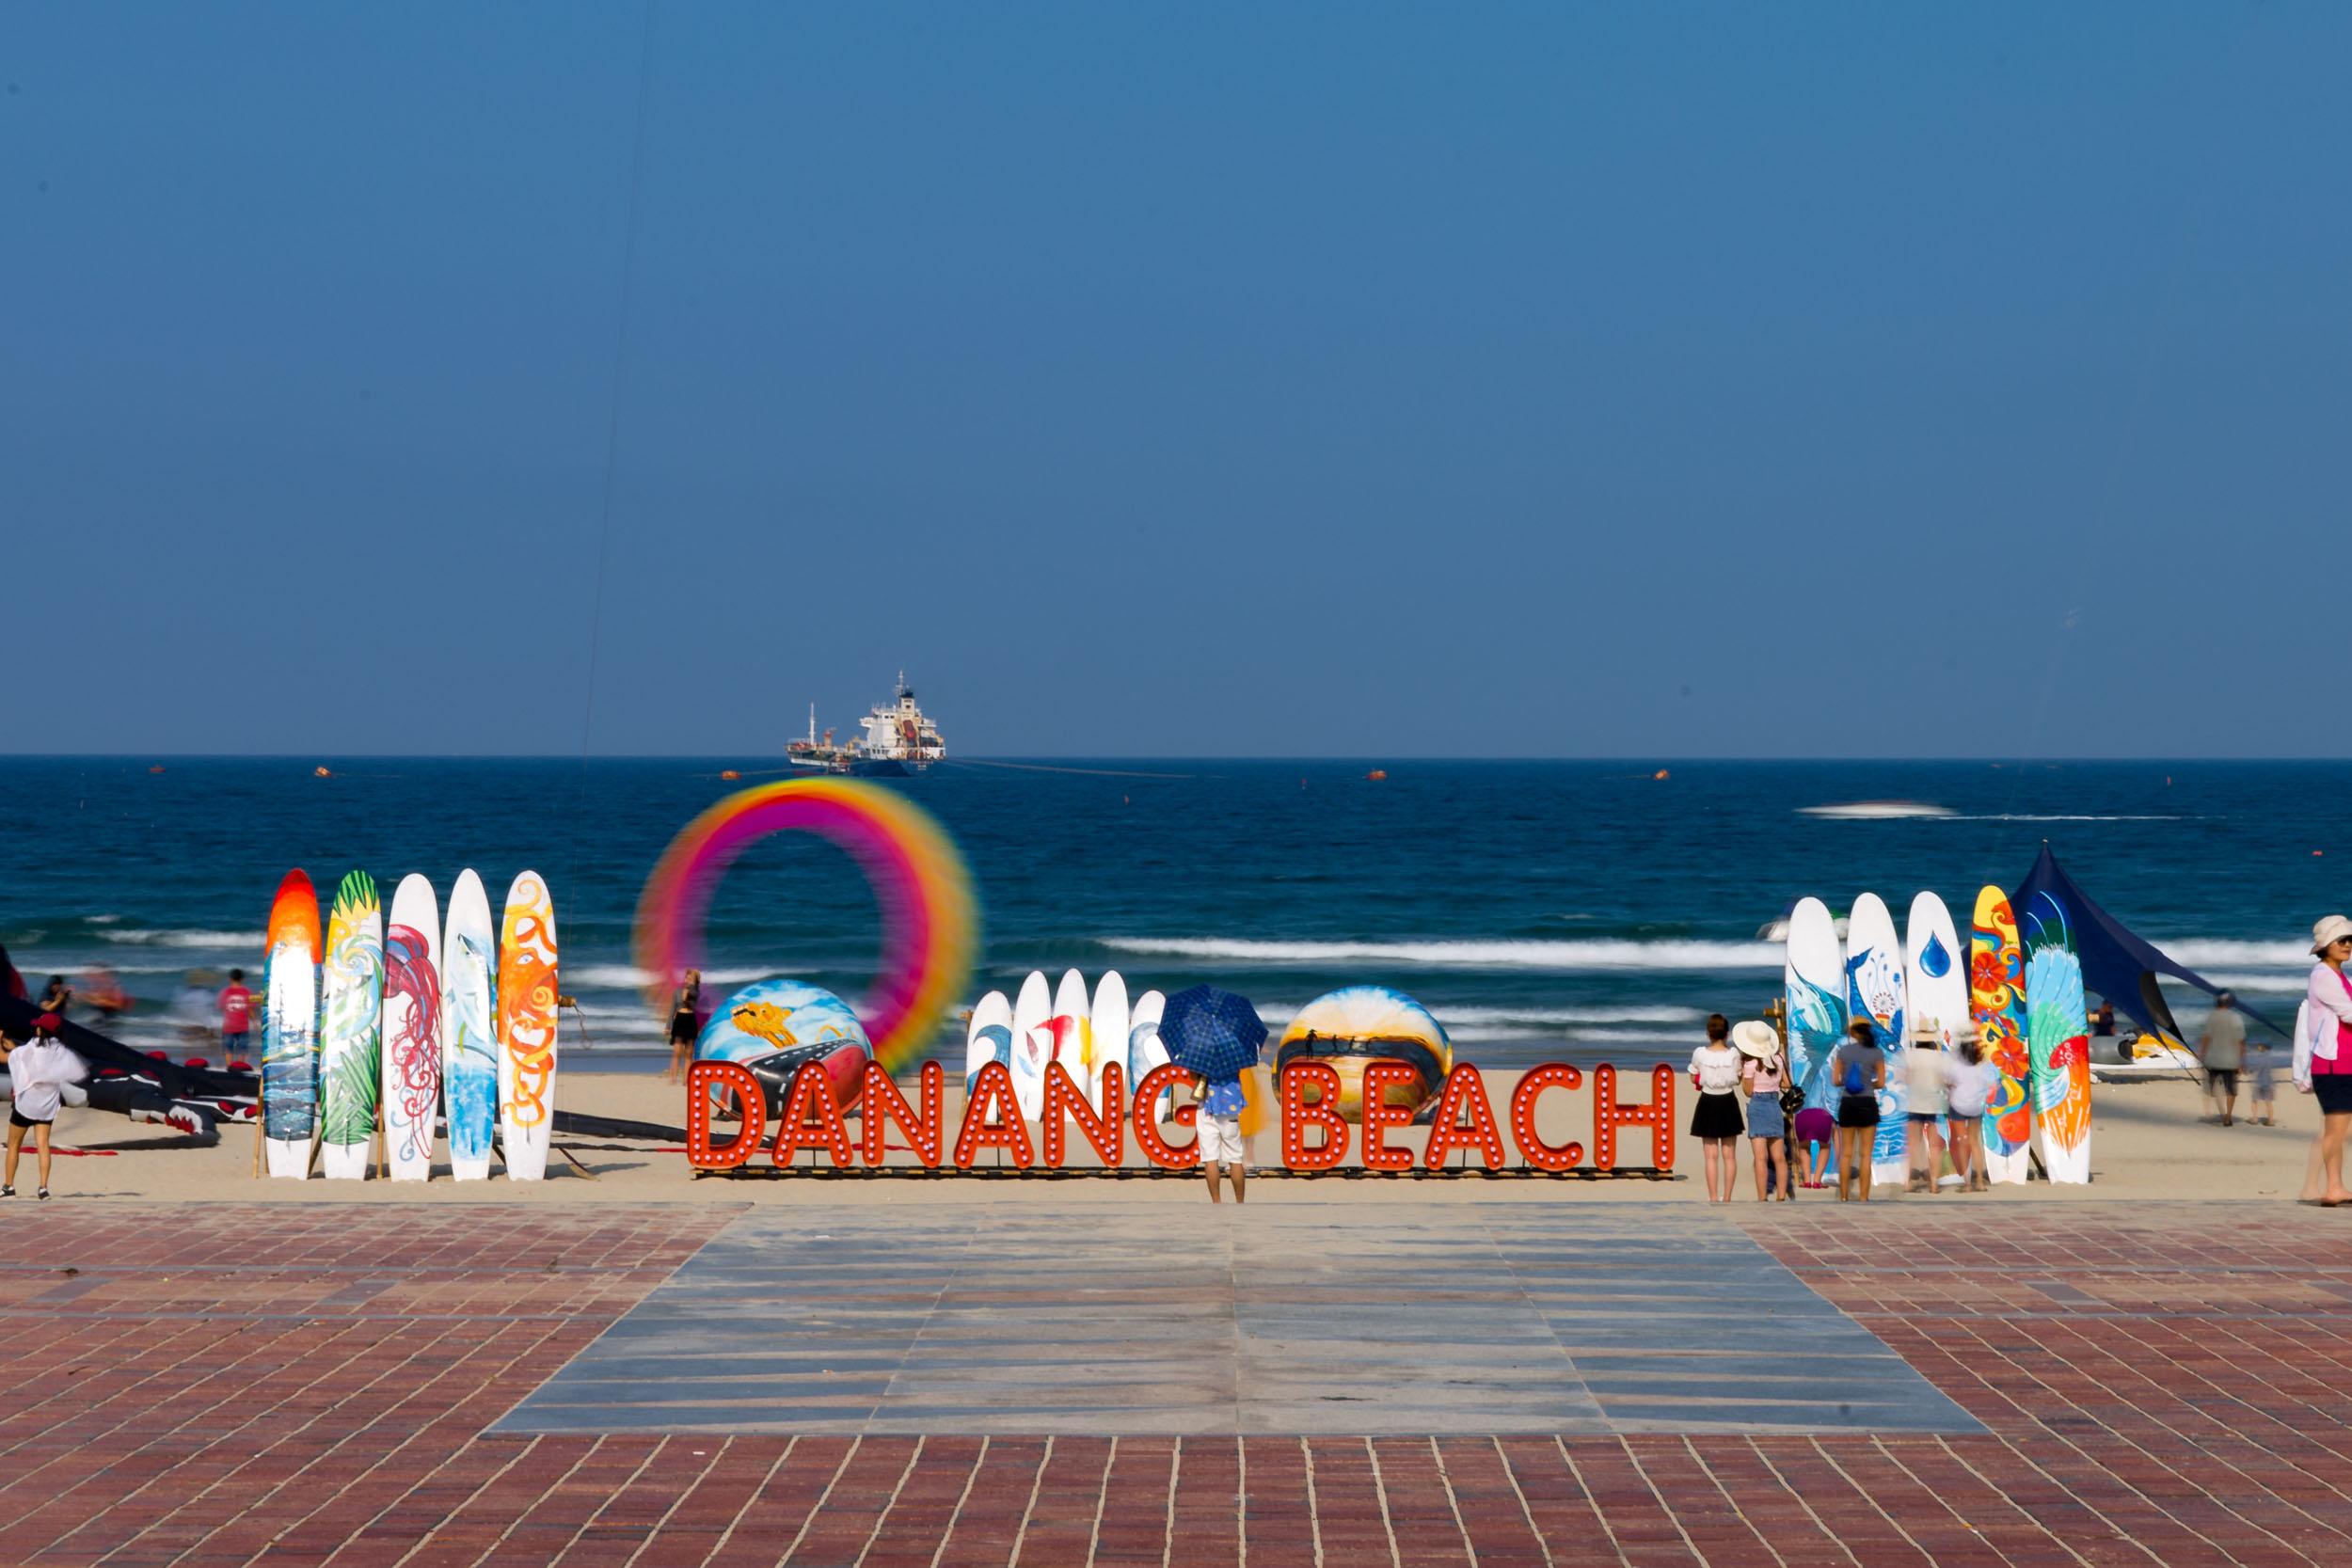 Da Nang beach Front Sign.